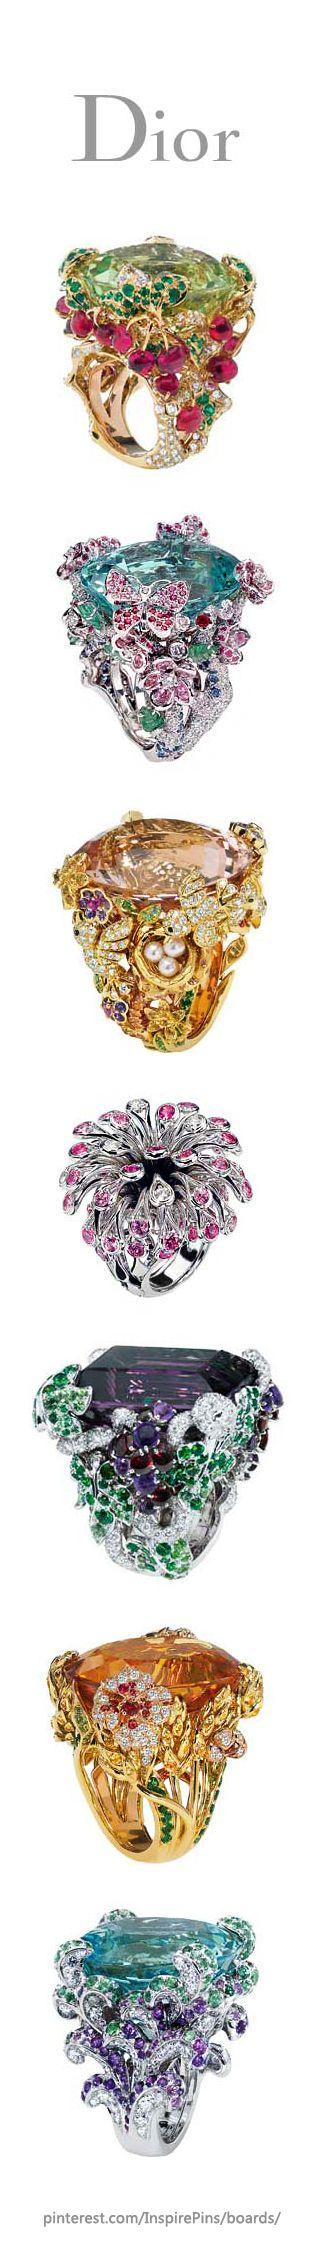 Dior Joaillerie Rings # Luxury #Dior #jewels #rings @nyrockphotogirl